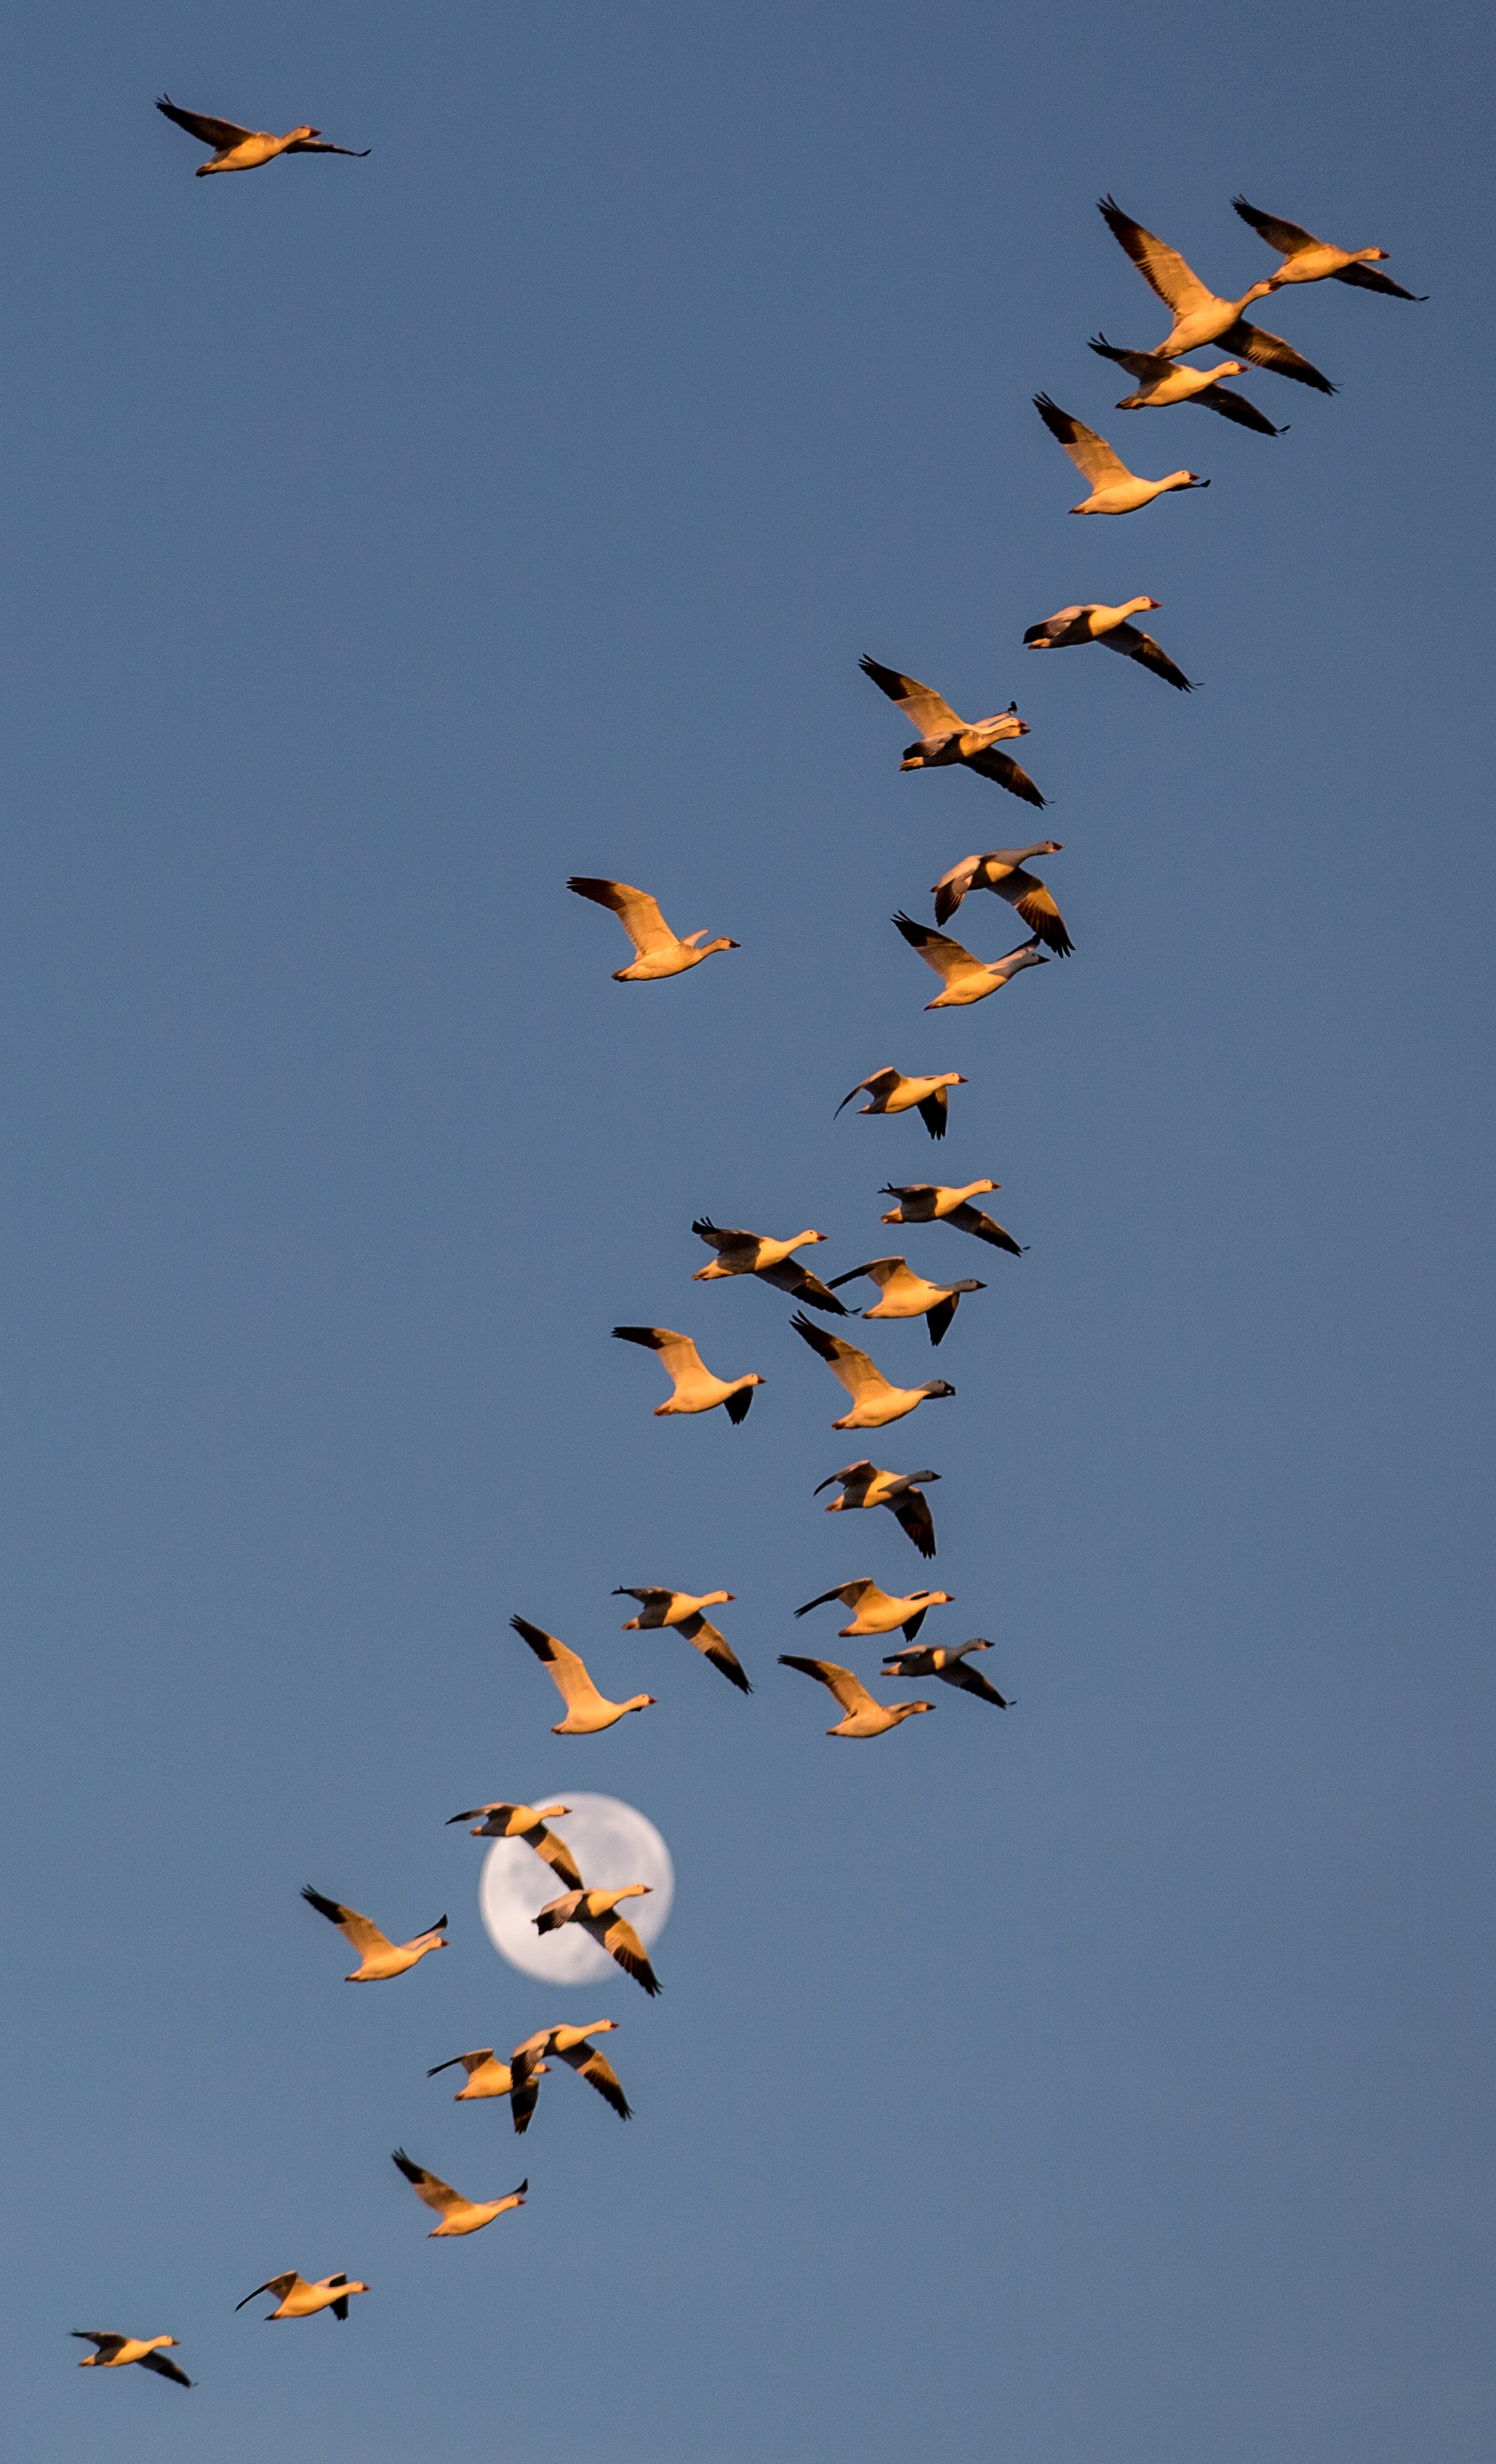 Rick Sammon's Birds006.jpg